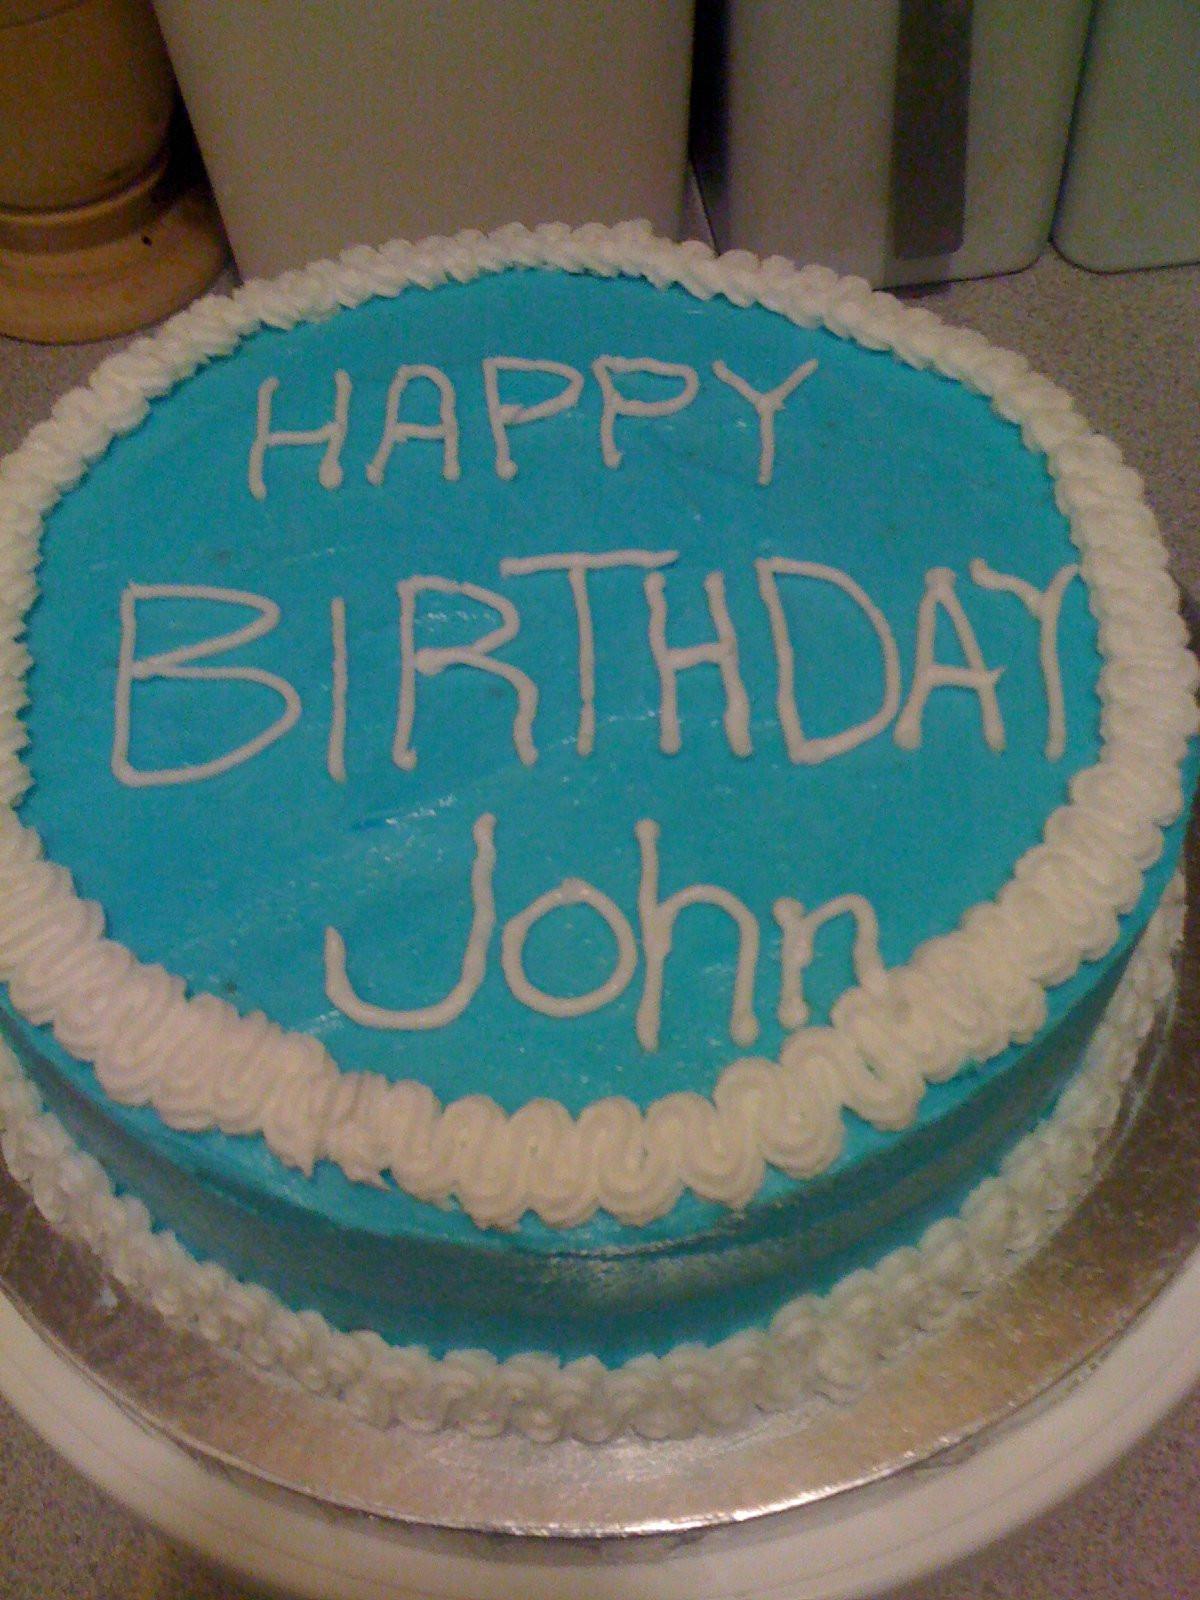 Best ideas about Happy Birthday John Cake . Save or Pin The Protean Libran Wilton Class 2 SpongeBob Birthday Now.